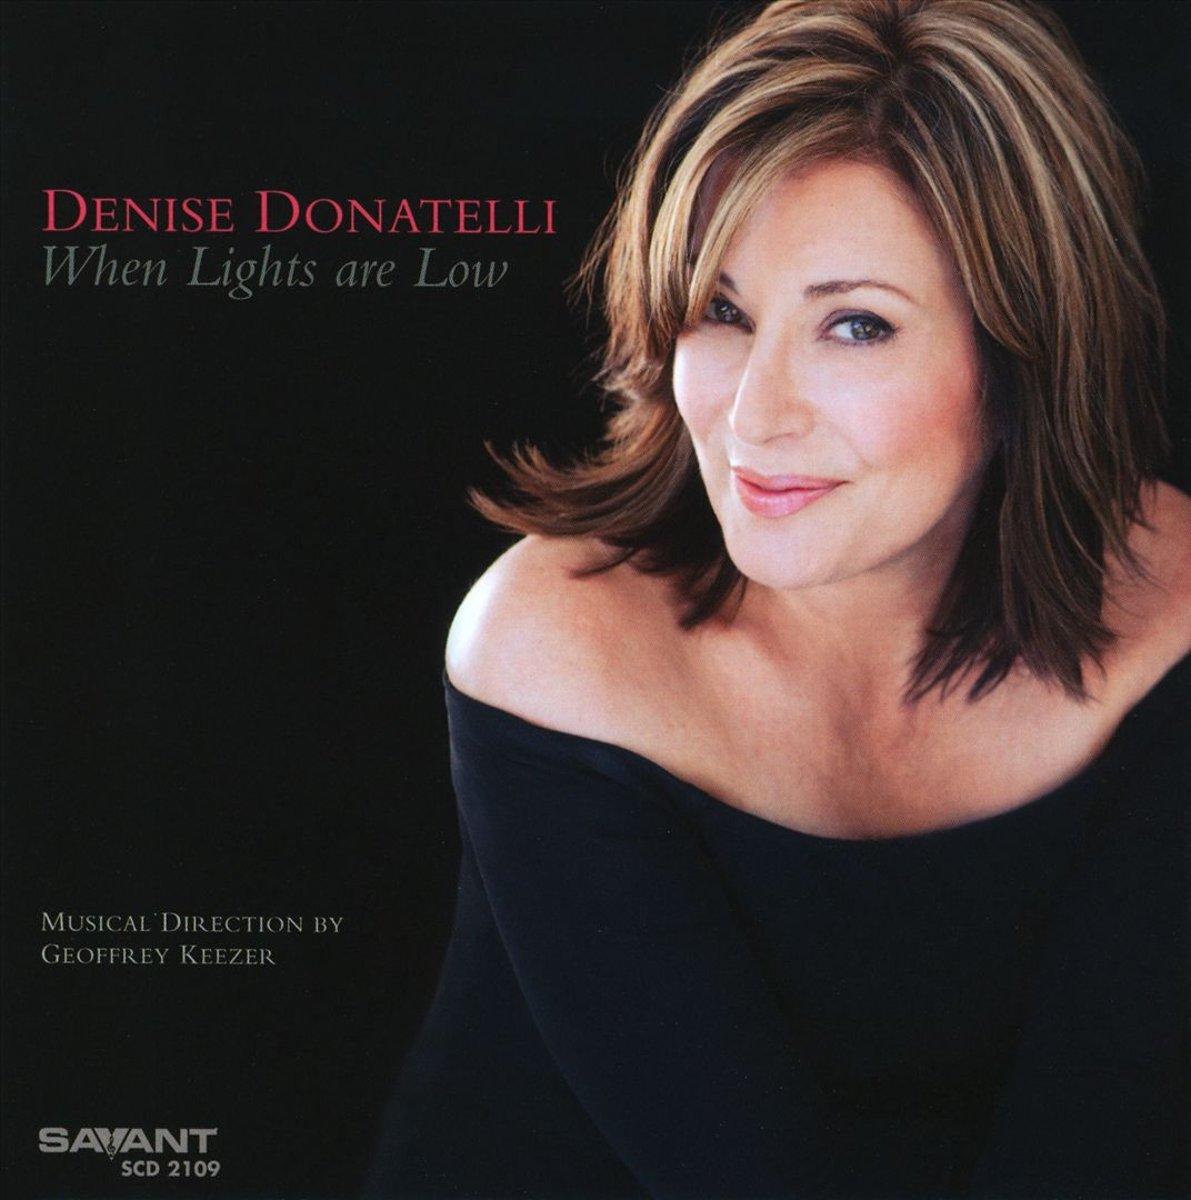 Denise Donatelli Denise Donatelli When Lights Are Low